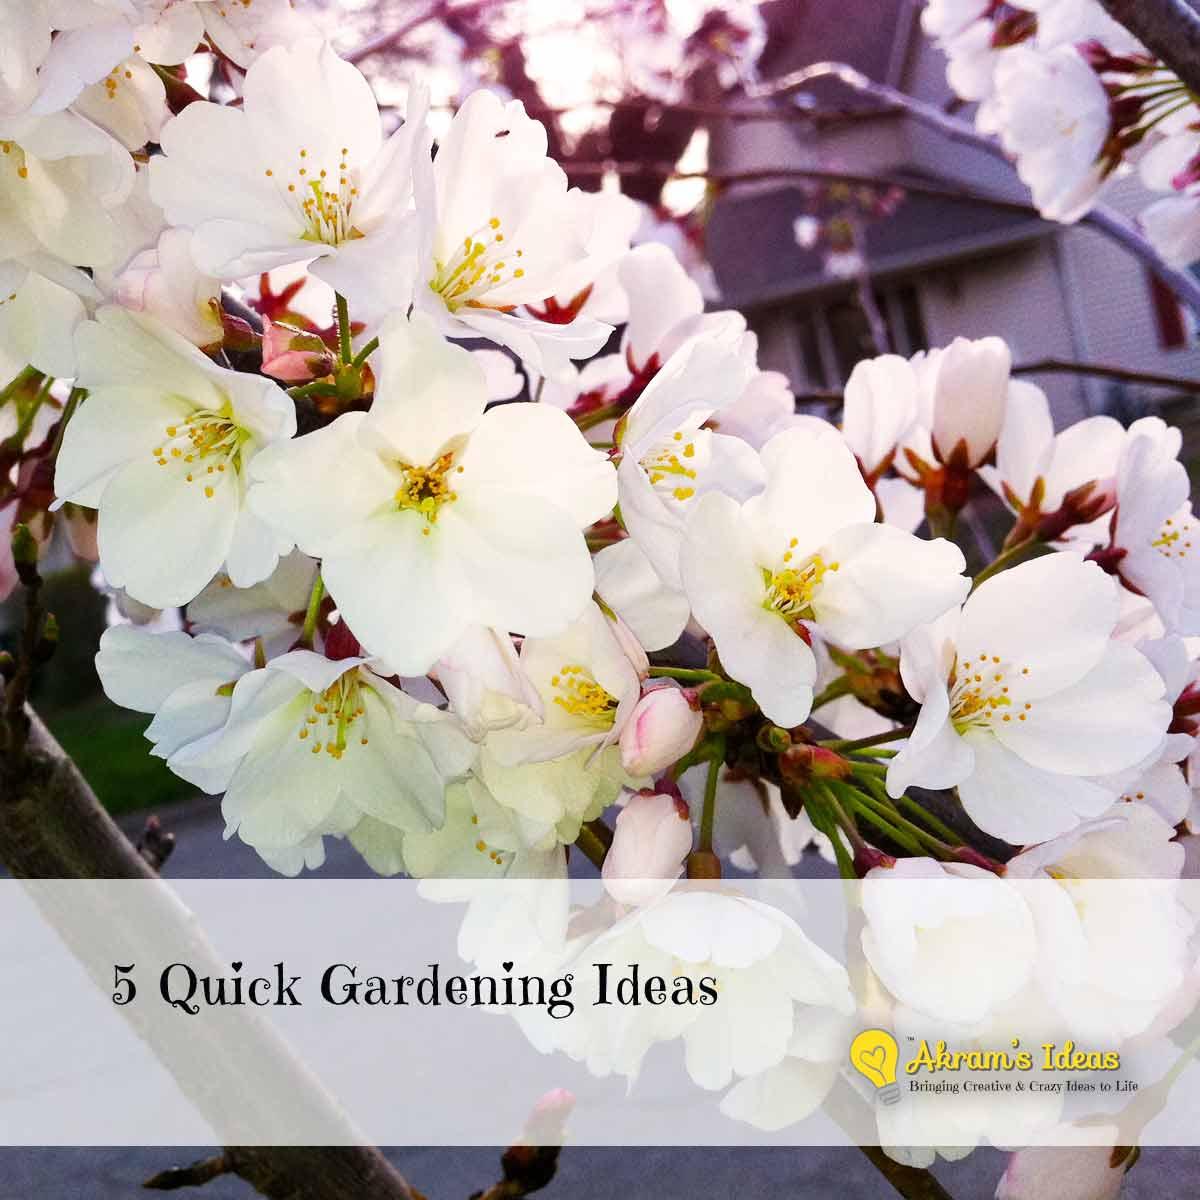 5 quick gardening ideas akram 39 s ideas for Quick garden design ideas